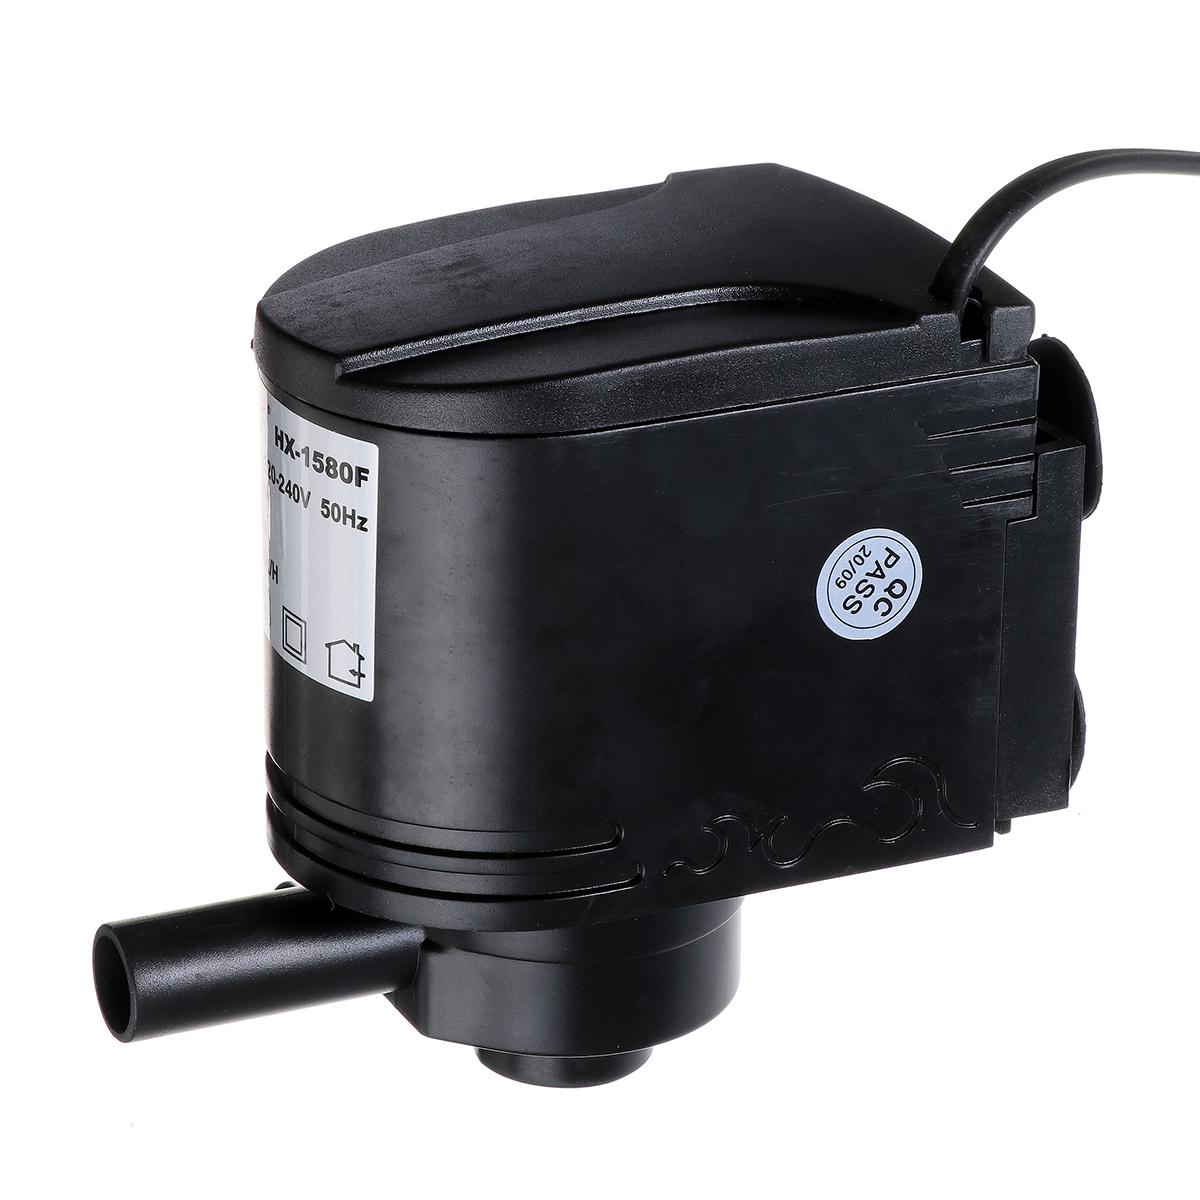 3 IN 1 12/18/25/35/40W Aquarium Water Internal Pump Submersible Fish Tank Filter Pump